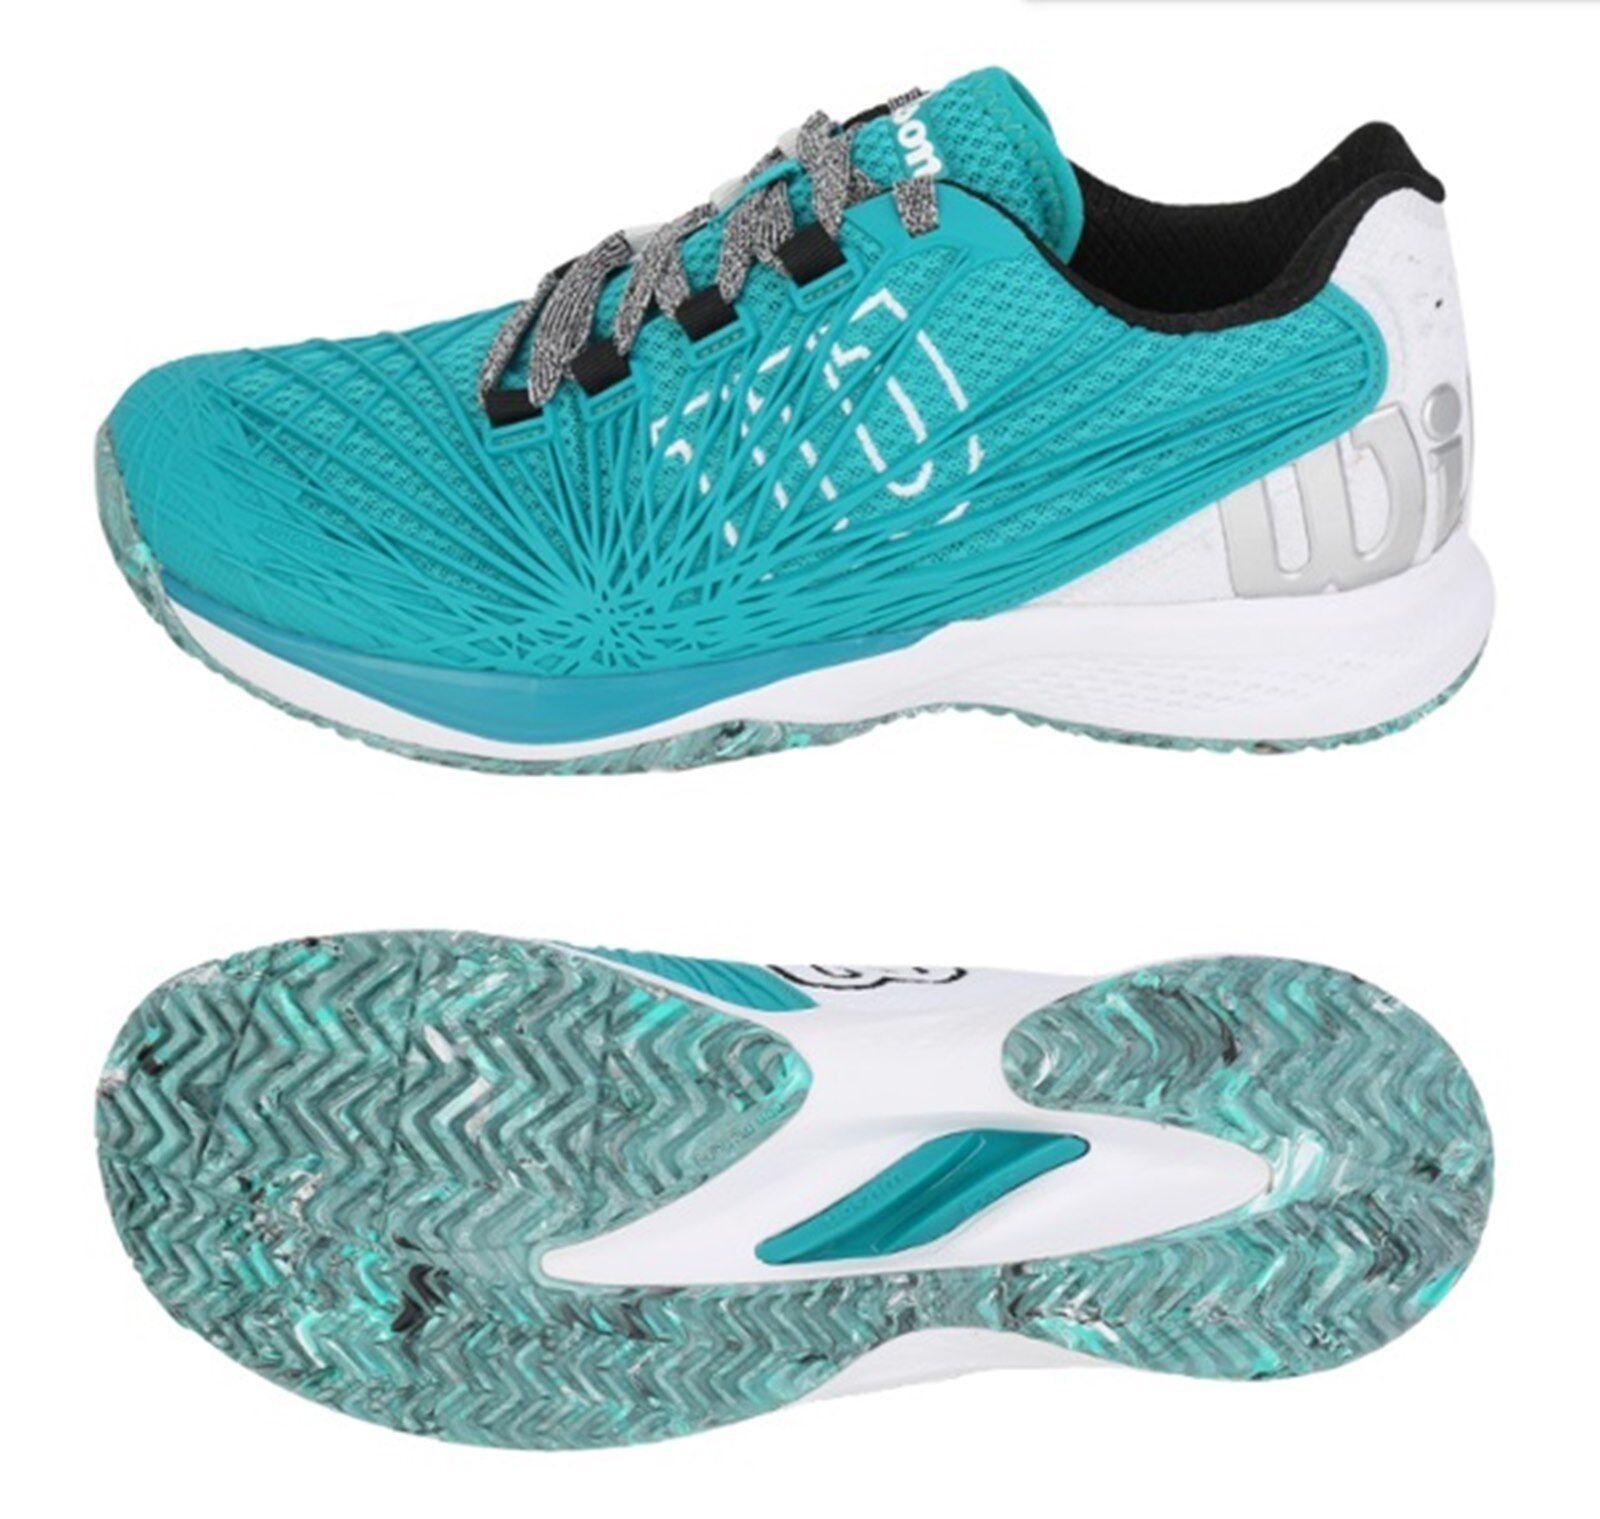 Wilson Hommes Kaos 2.0 Tennis chaussures FonctionneHommest Mint Whcravate paniers GYM chaussures WRS323530